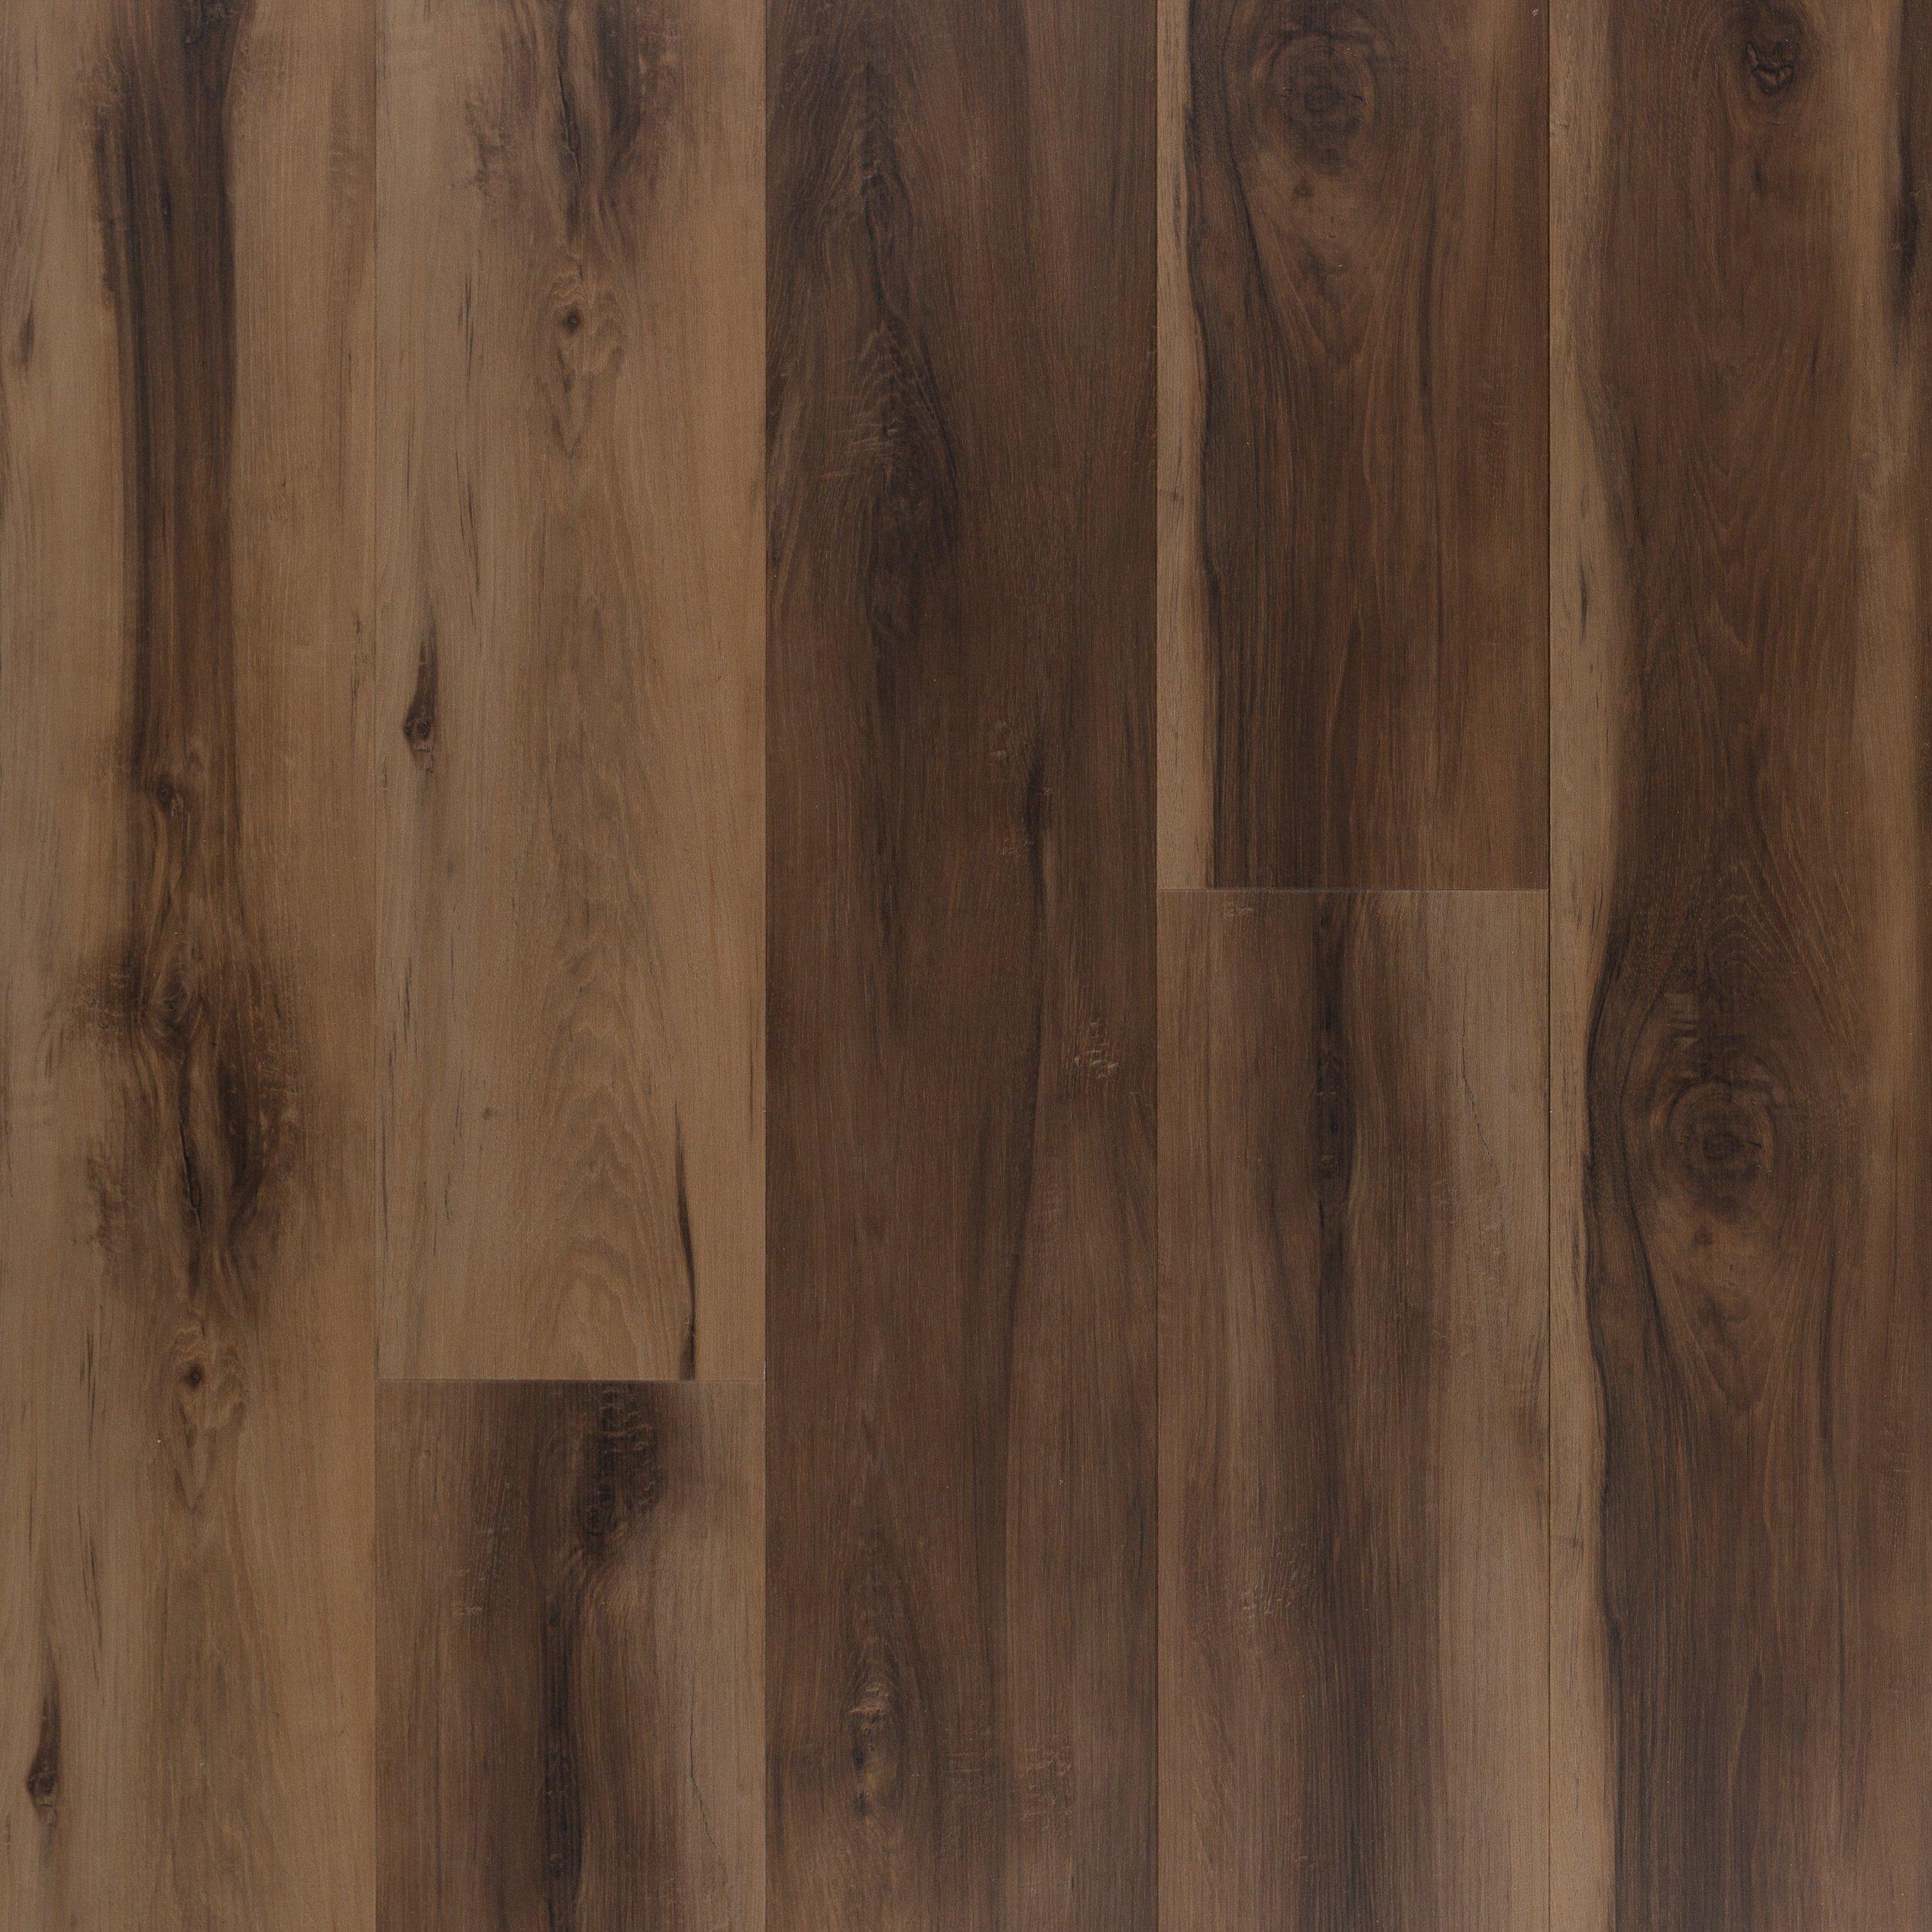 Spalted Walnut Rigid Core Luxury Vinyl Plank Cork Back